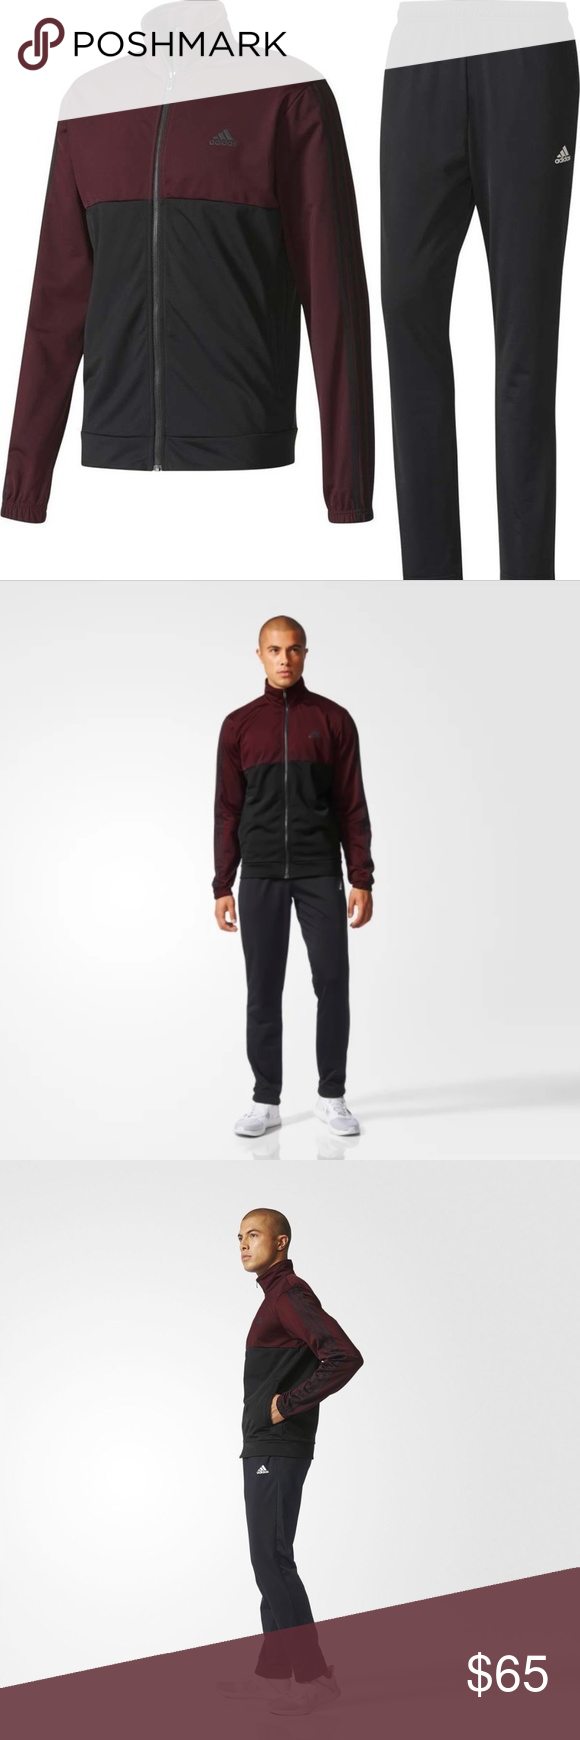 316b428e26da Adidas Men Size M Tracksuit BQ8357 Brand New